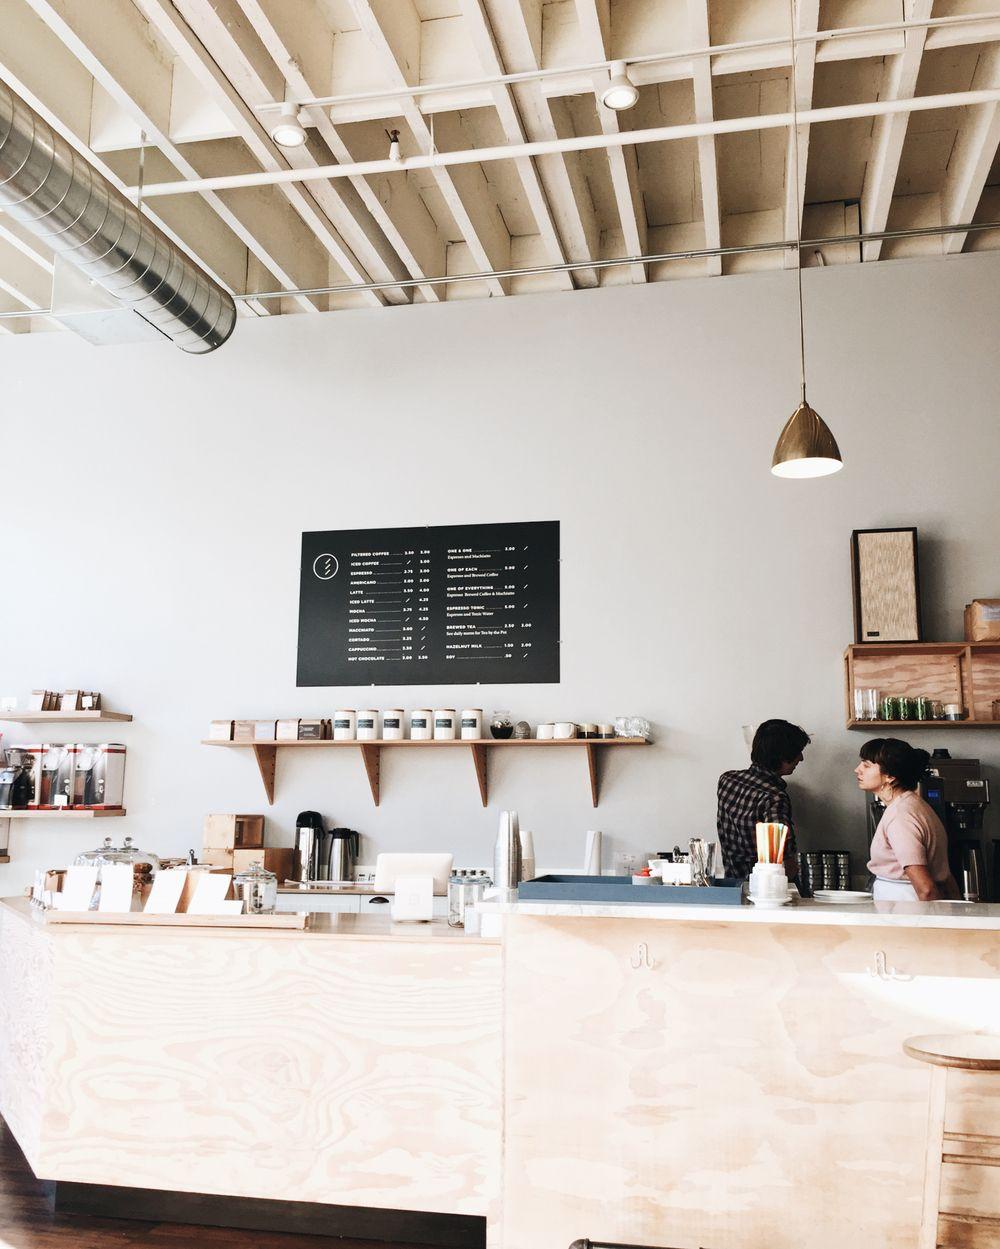 Elm Coffee, Seattle | Minimalist | Coffee shop design, Coffee cafe ... #coffeeShop